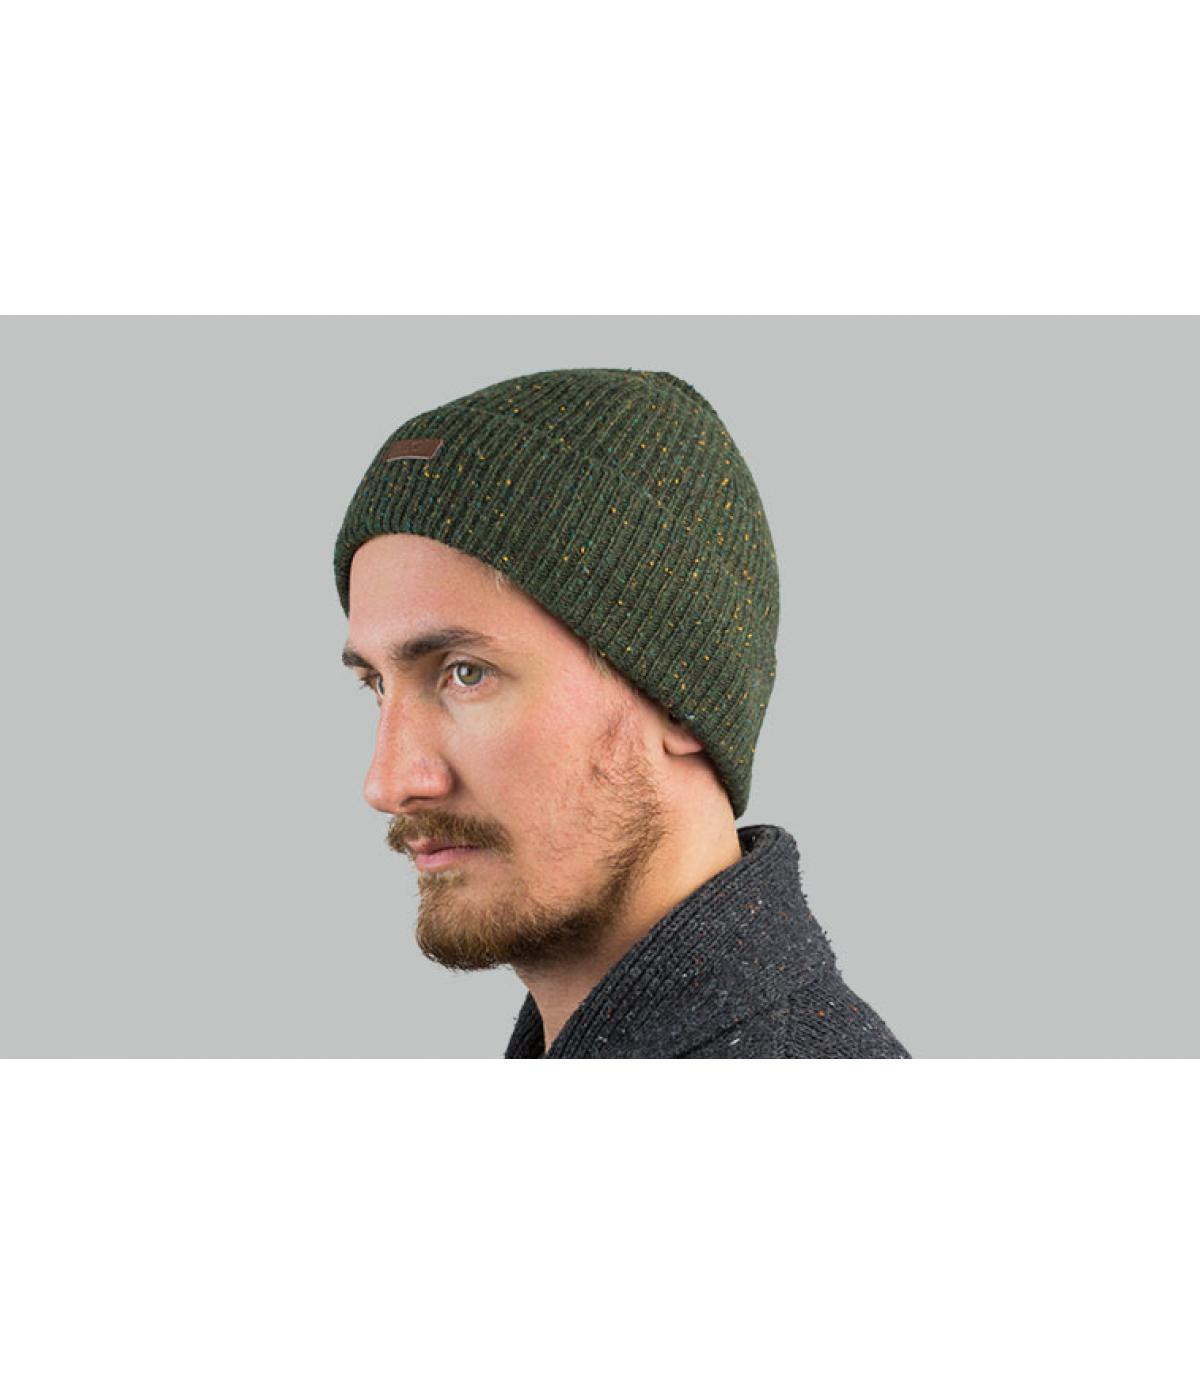 bonnet revers vert chiné